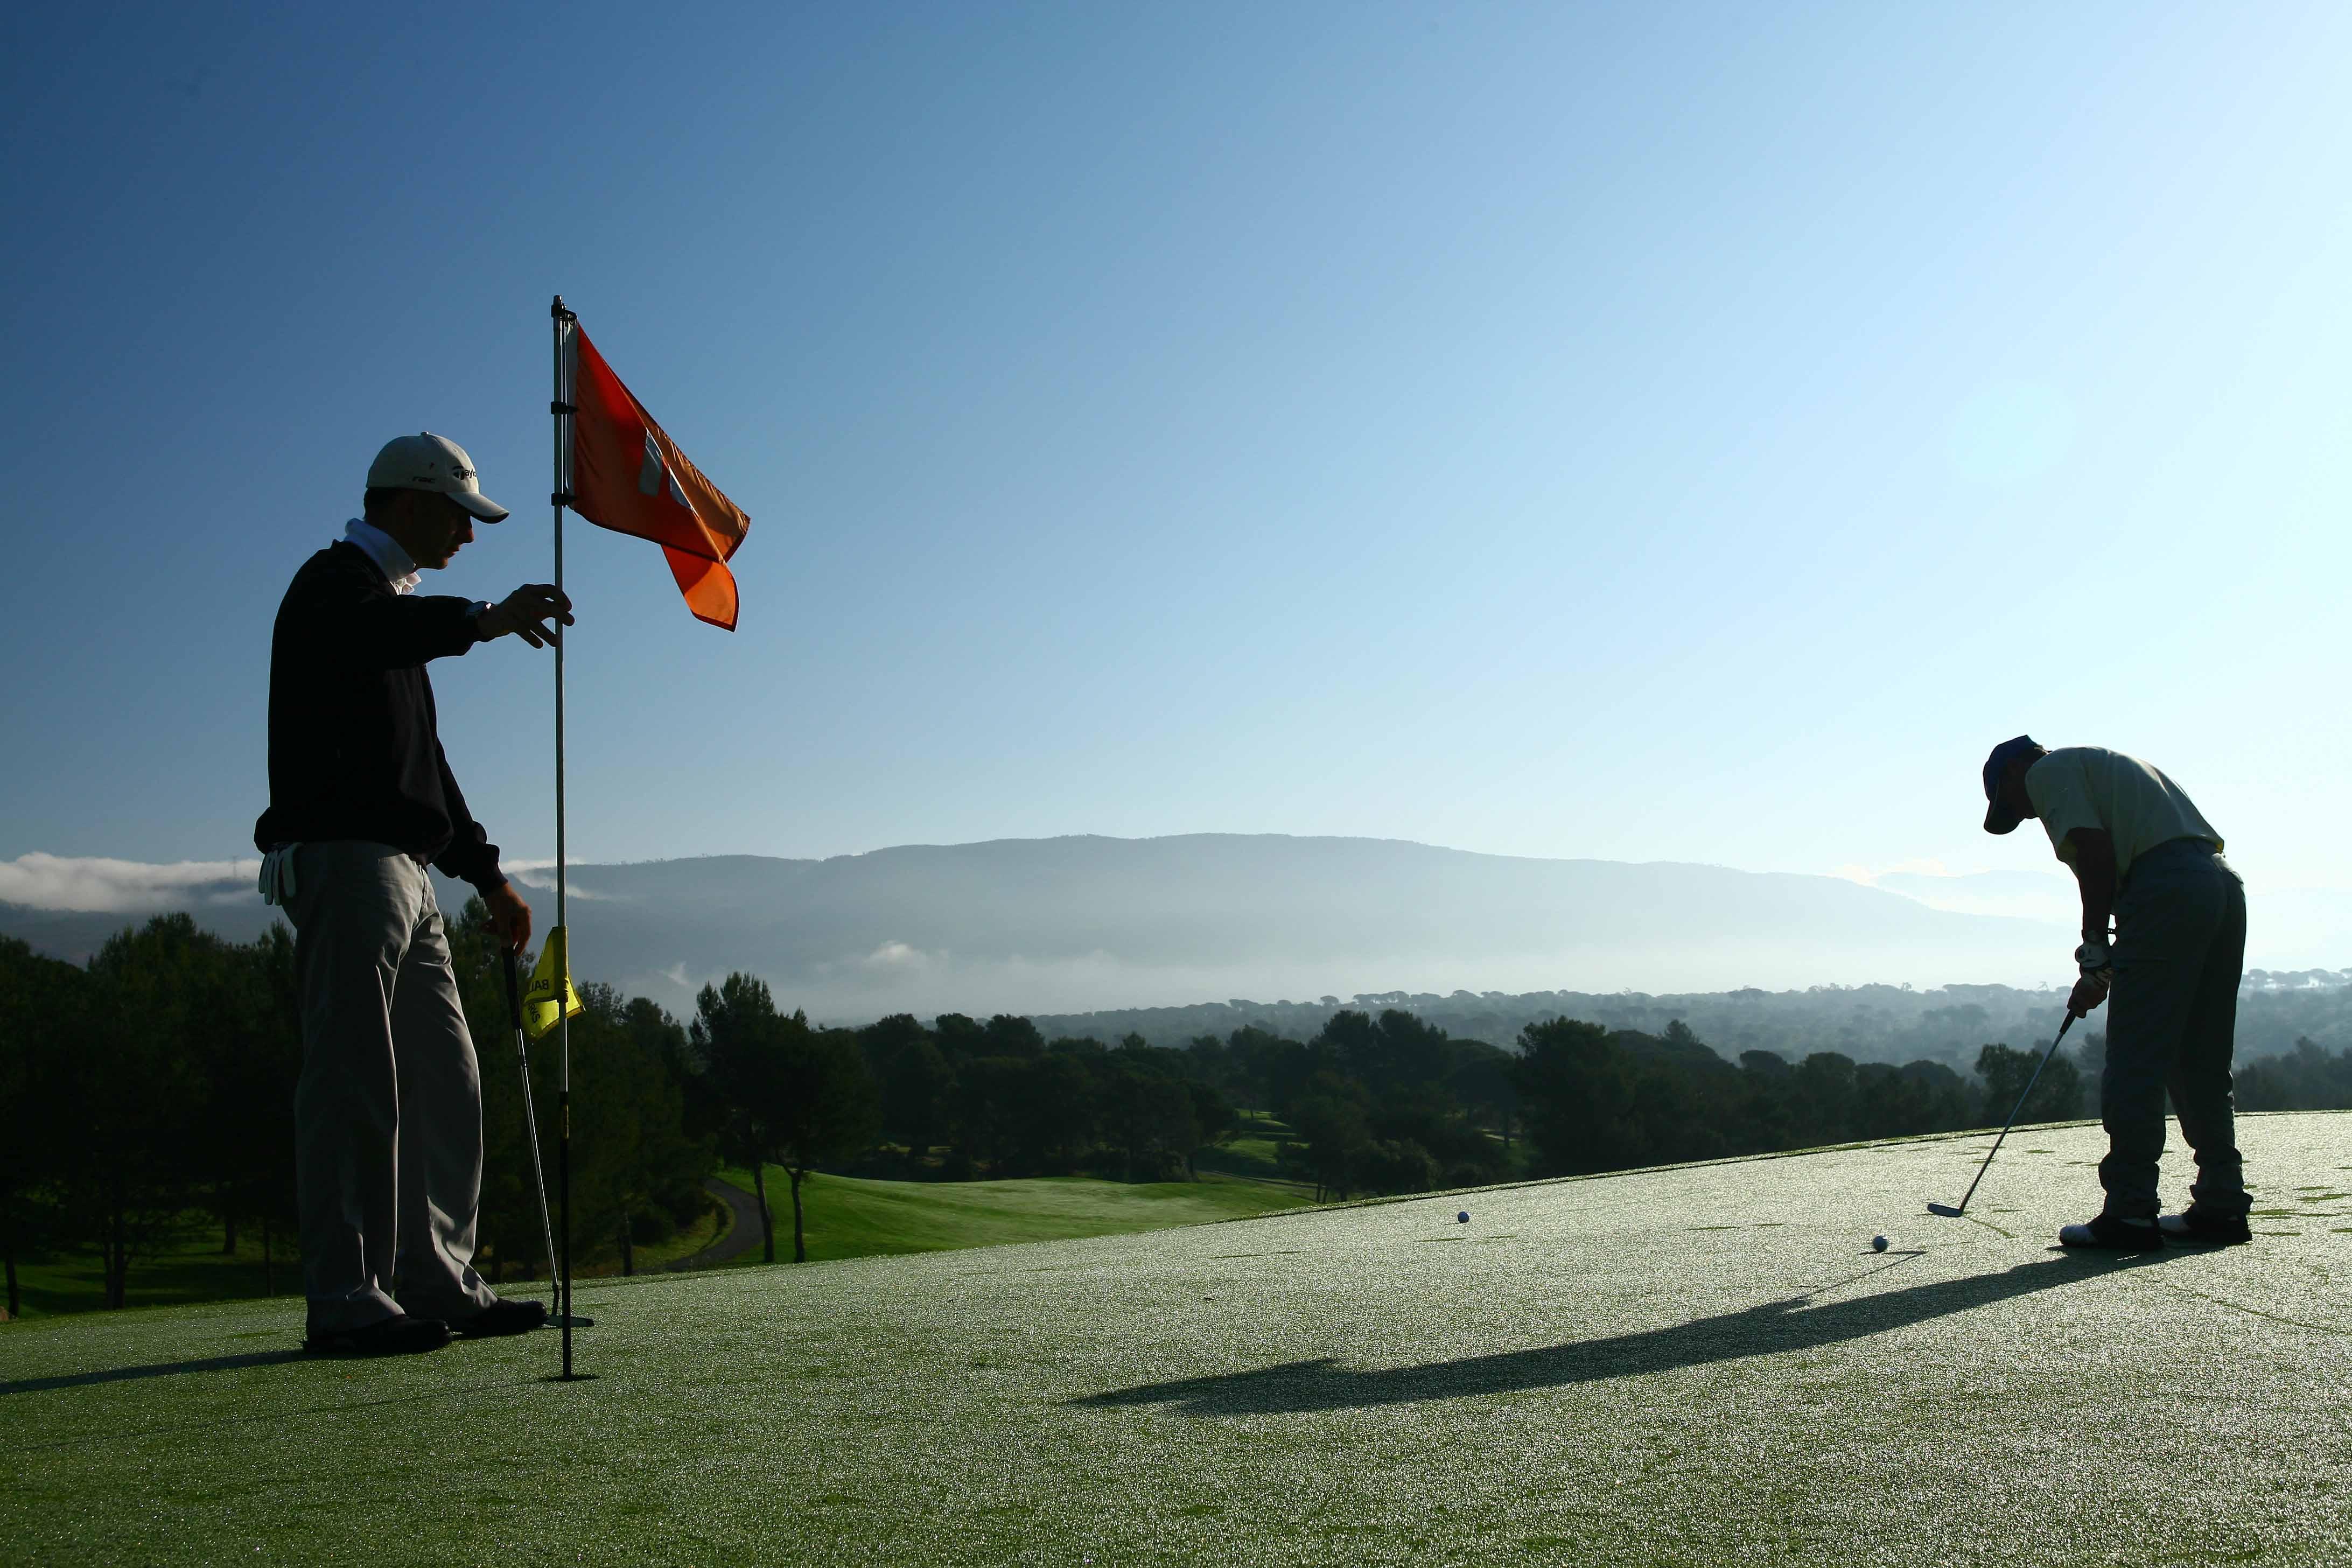 golf-expedition-golf-reizen-frankrijk-regio-cote-d'azur-Les-Domaines-de-Saint-Endréol-Golf-en-Spa-Resort-golfers